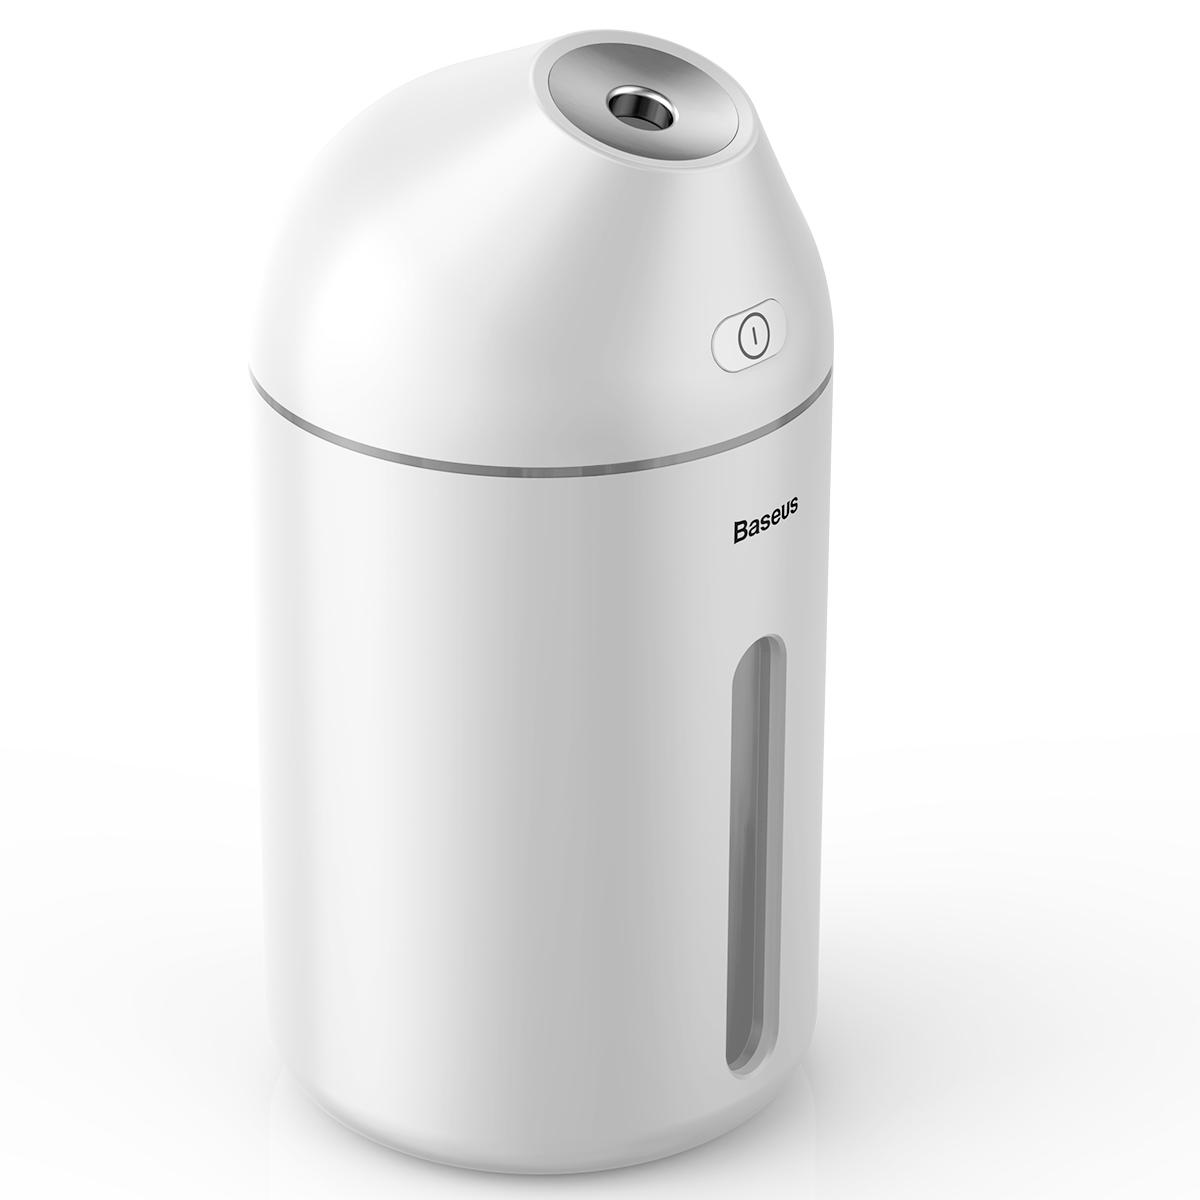 Мини-Увлажнитель воздуха Baseus Cute Mini Humidifier White